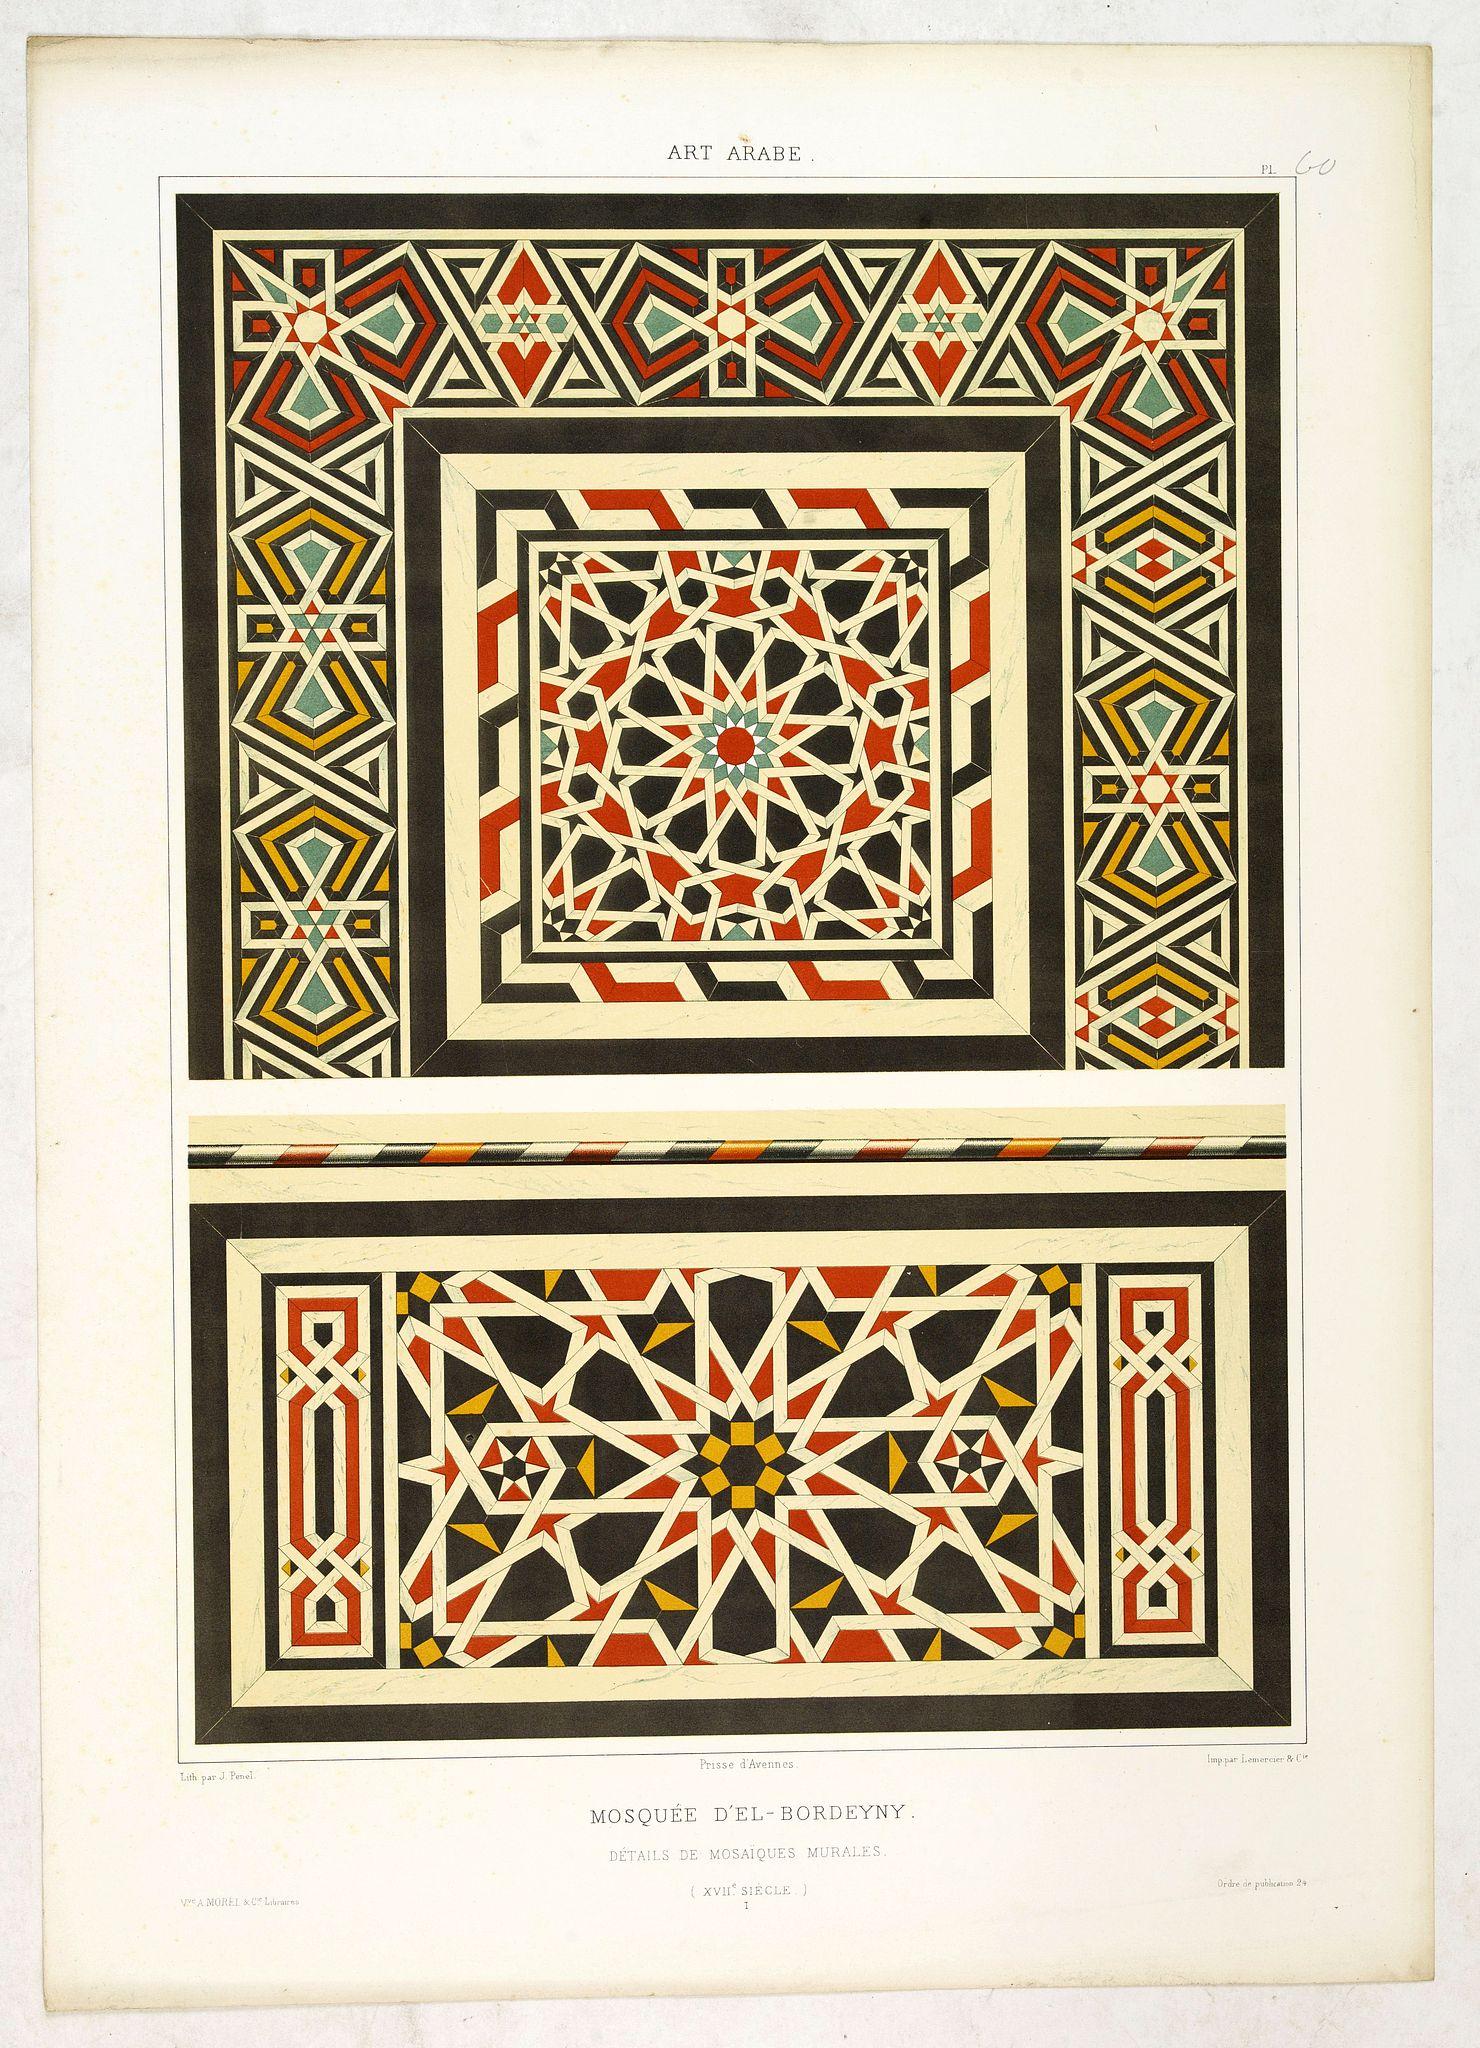 PRISSE D'AVENNES, E. -  Art arabe. - Mosquée d'el-Bordeyny. . .